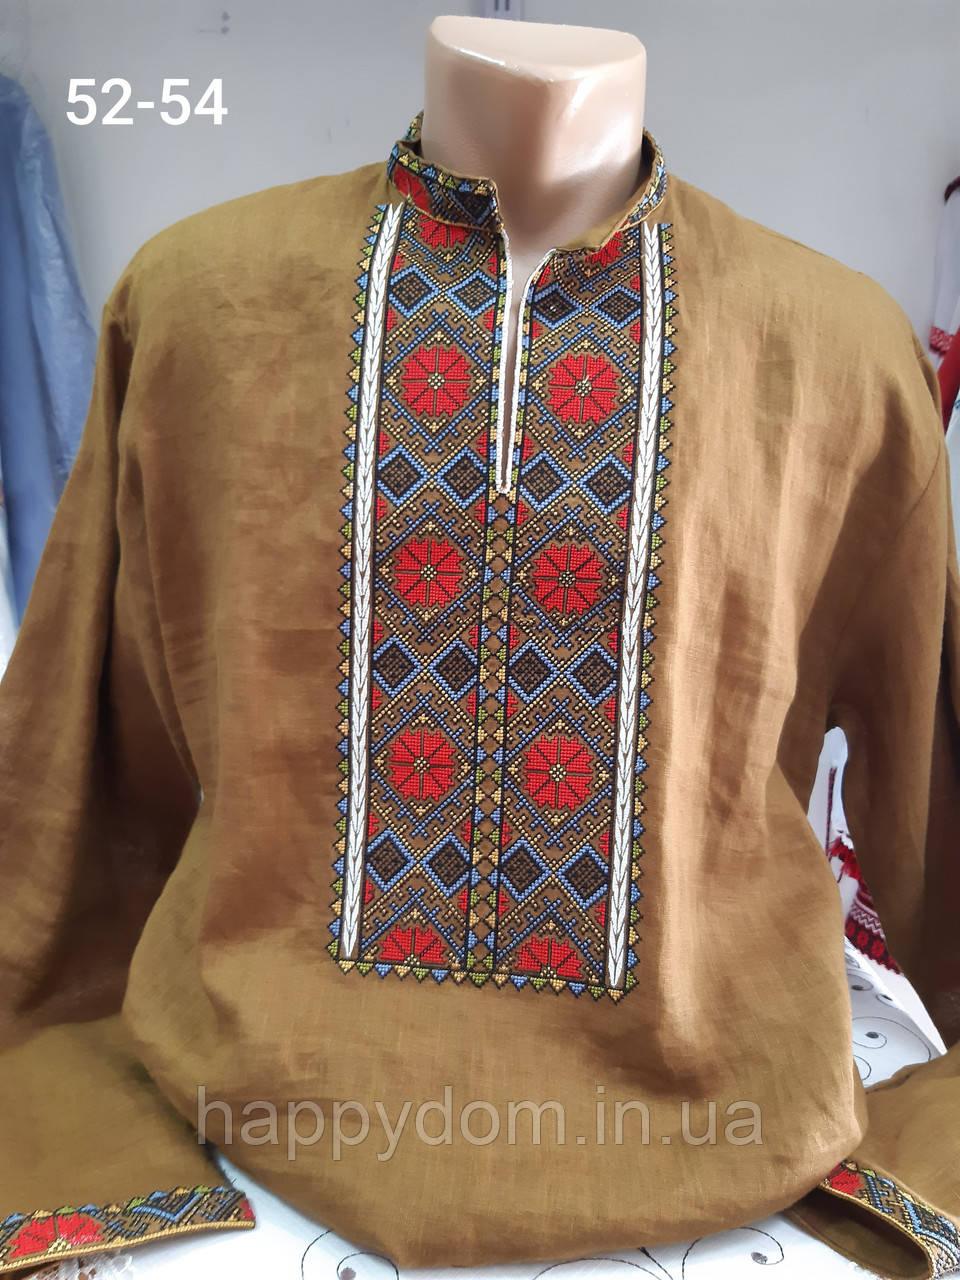 Рубашка вышиванка мужская вышитая горчичная